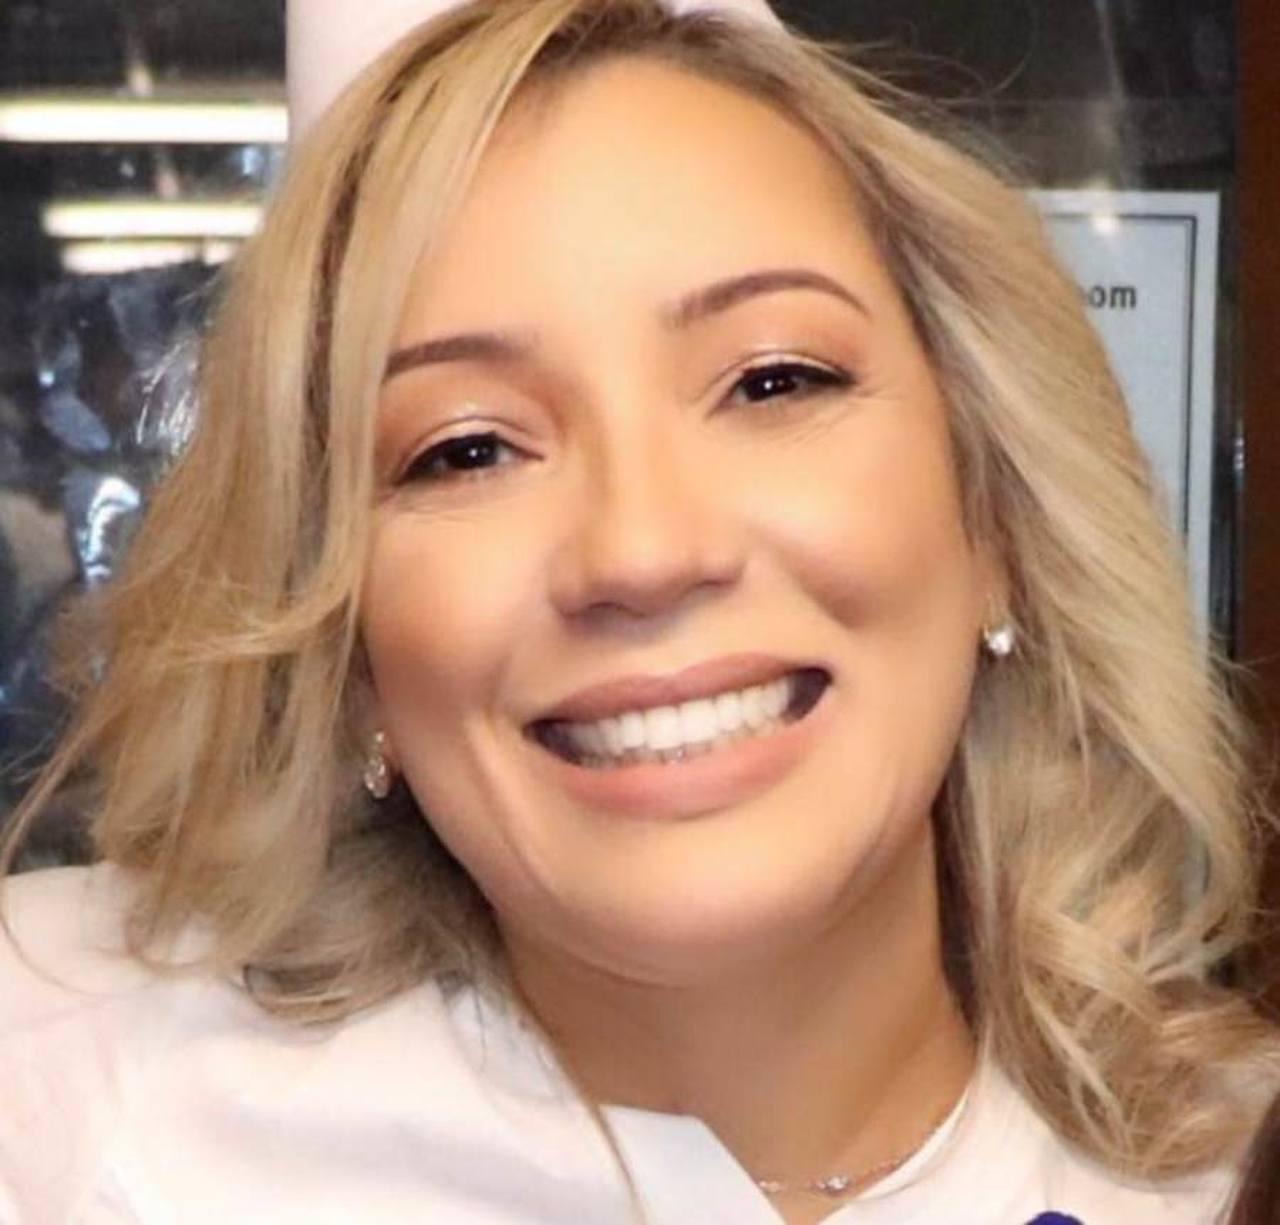 Keila Silva no combate ao COVID 19